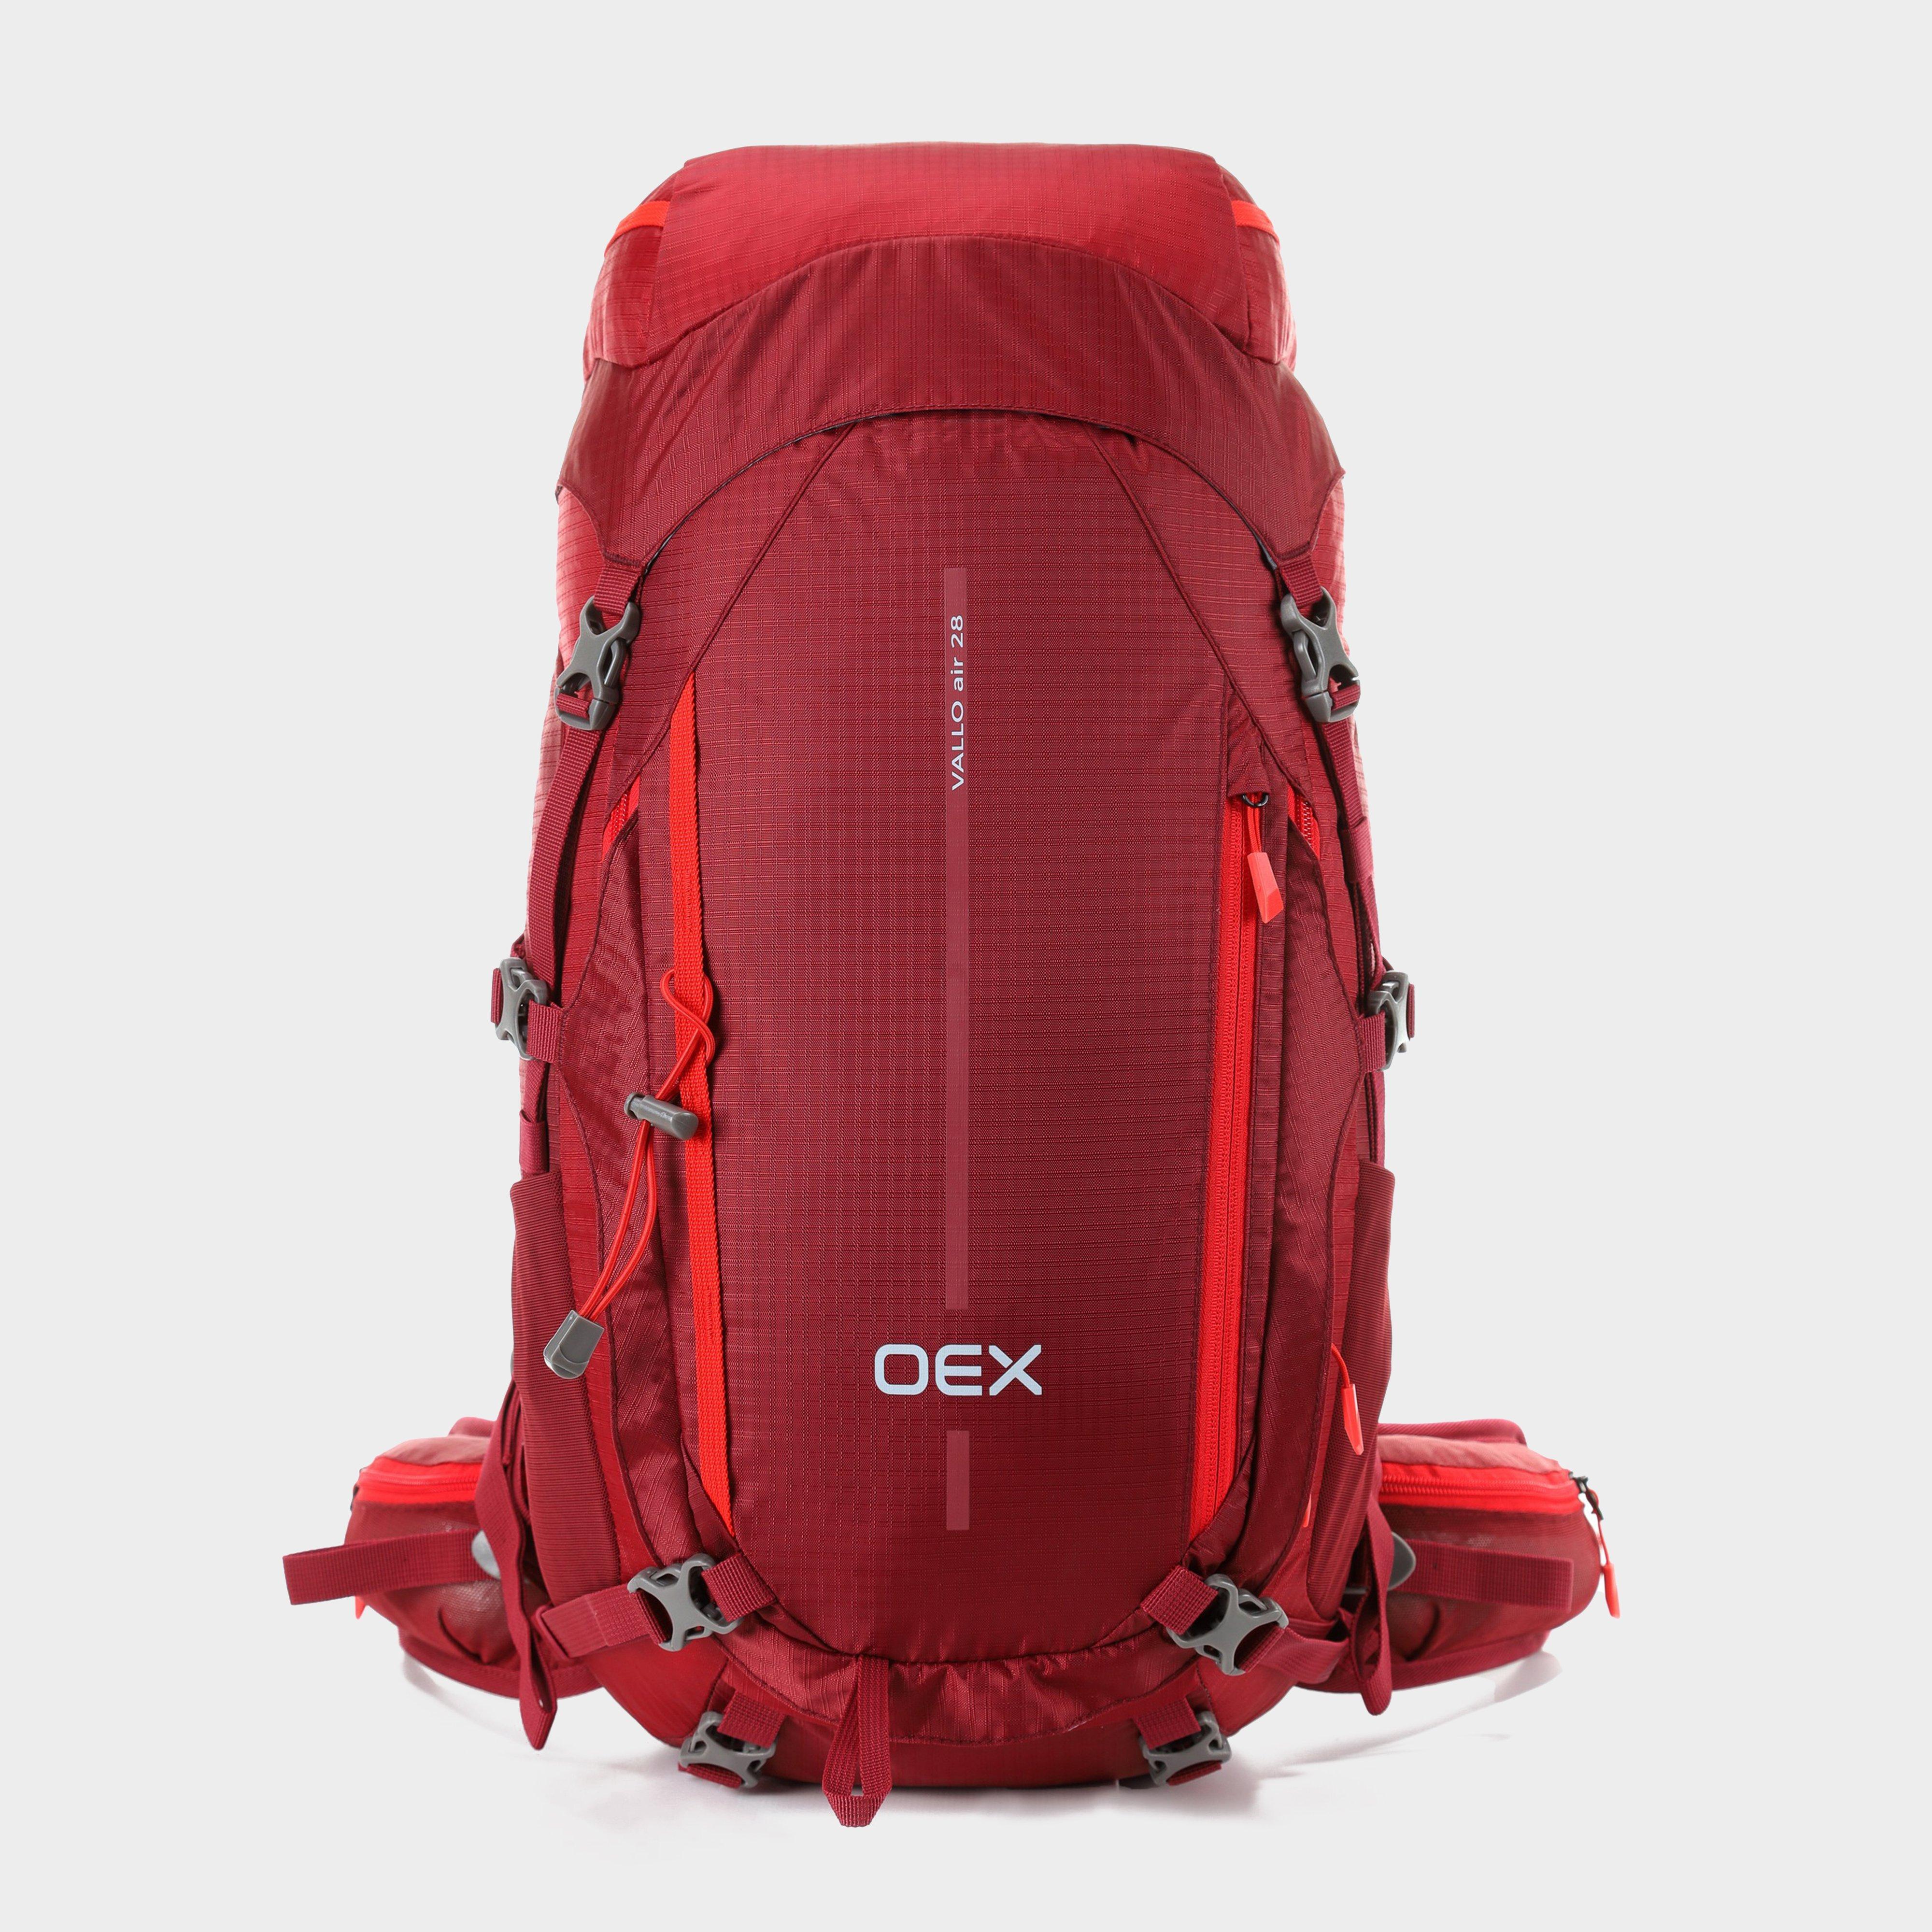 Oex Oex Vallo Air 28 Rucksack - Red, Red